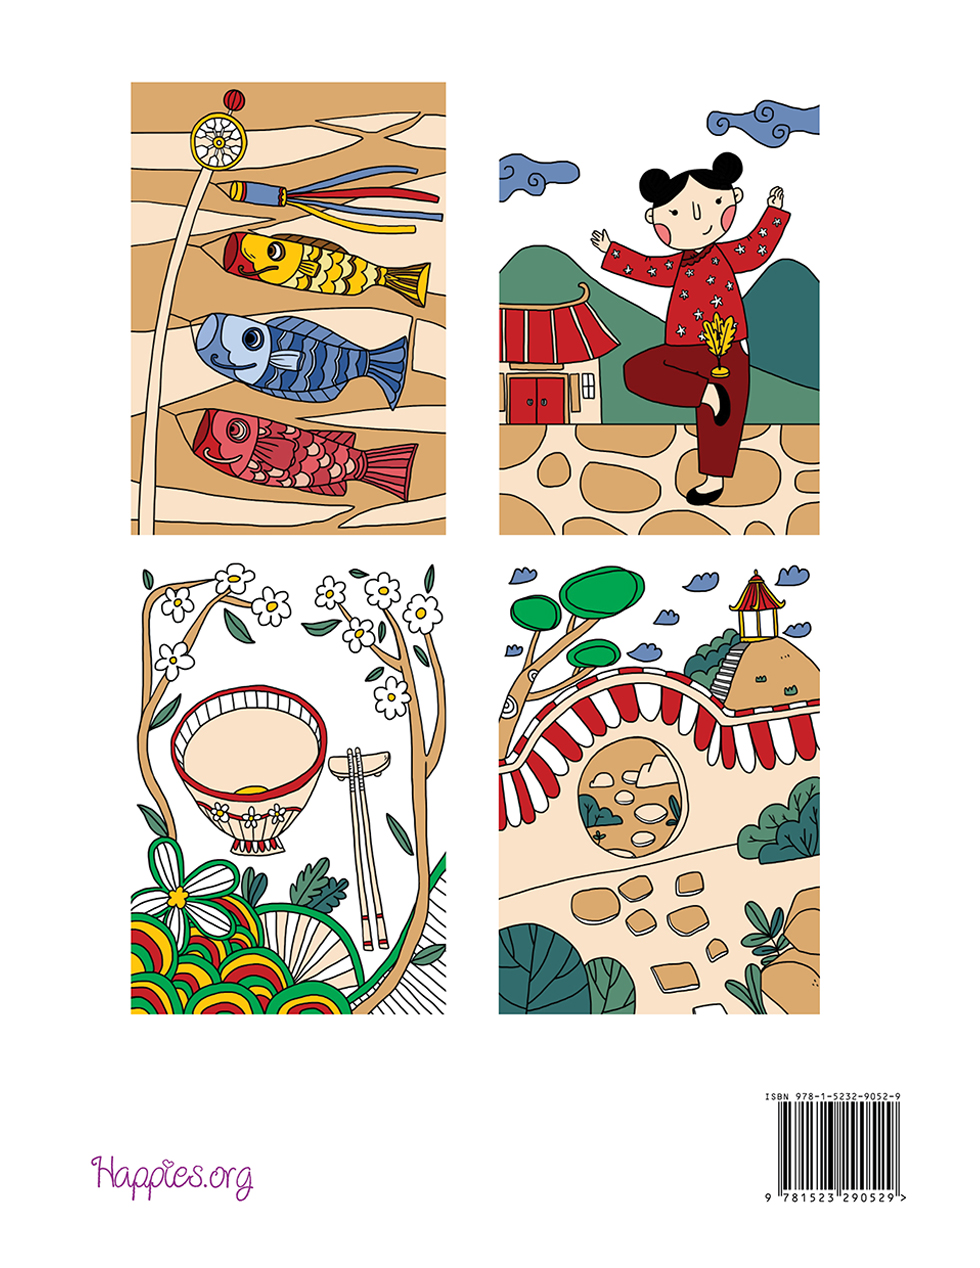 Happies - Eastern Magic Coloring Book: Amazing Oriental Designs